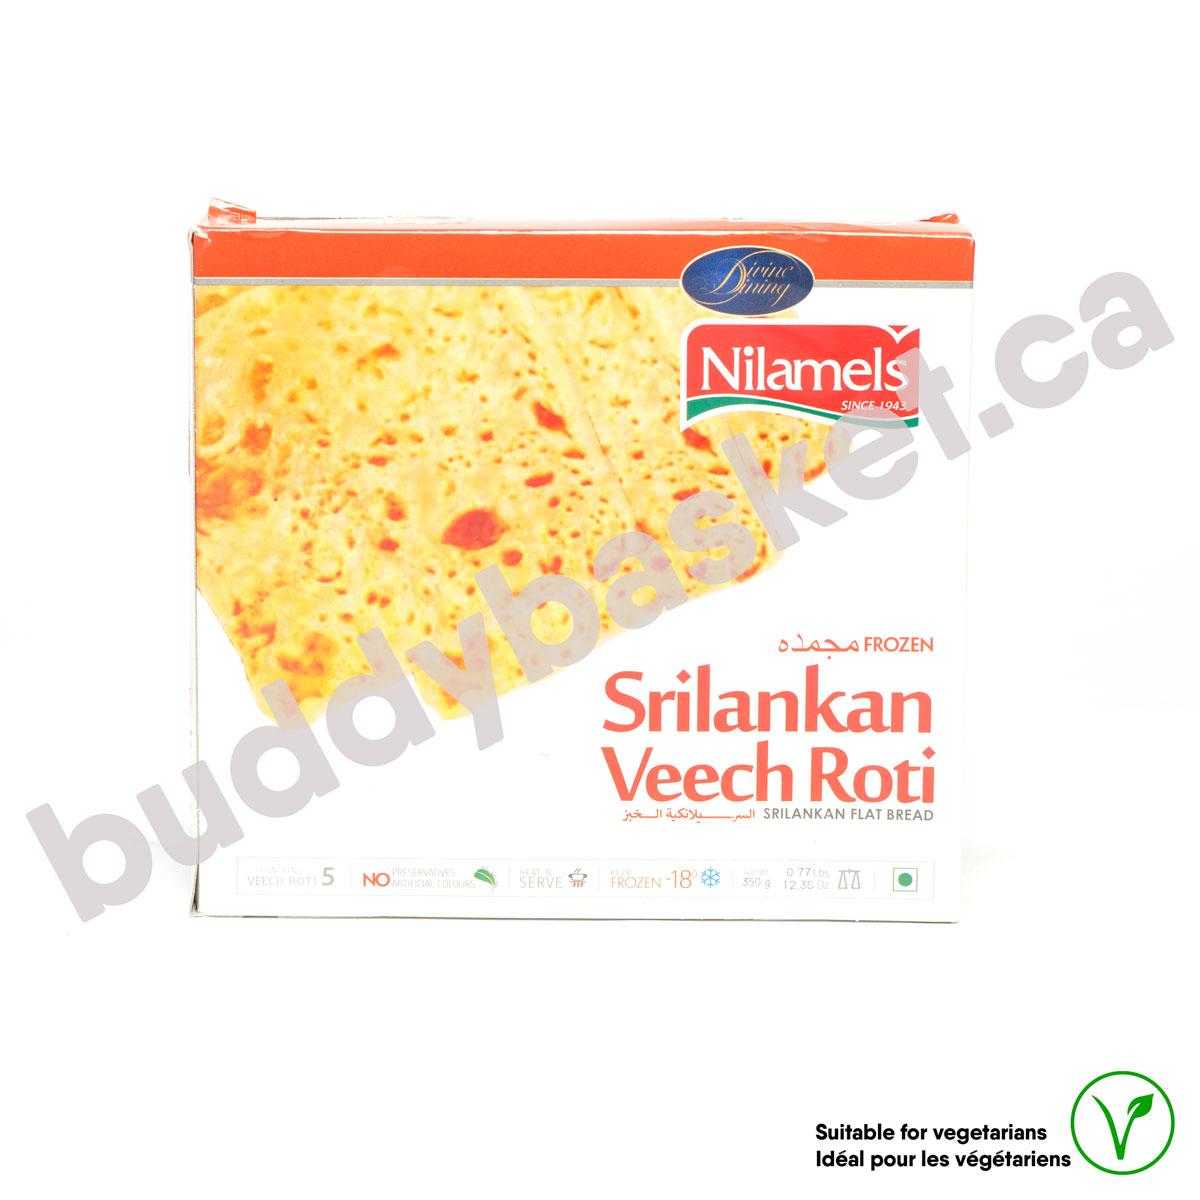 Nilamels Veech RotI 350g